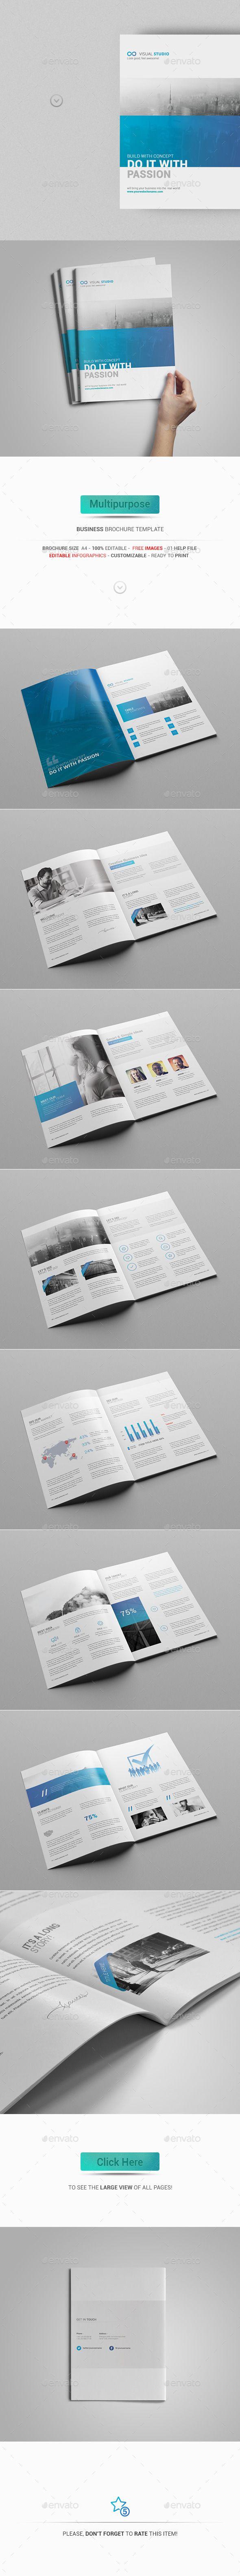 Multipurpose Business Brochure Tempalte #design Download: http://graphicriver.net/item/multipurpose-business-brochure-template/12910268?ref=ksioks